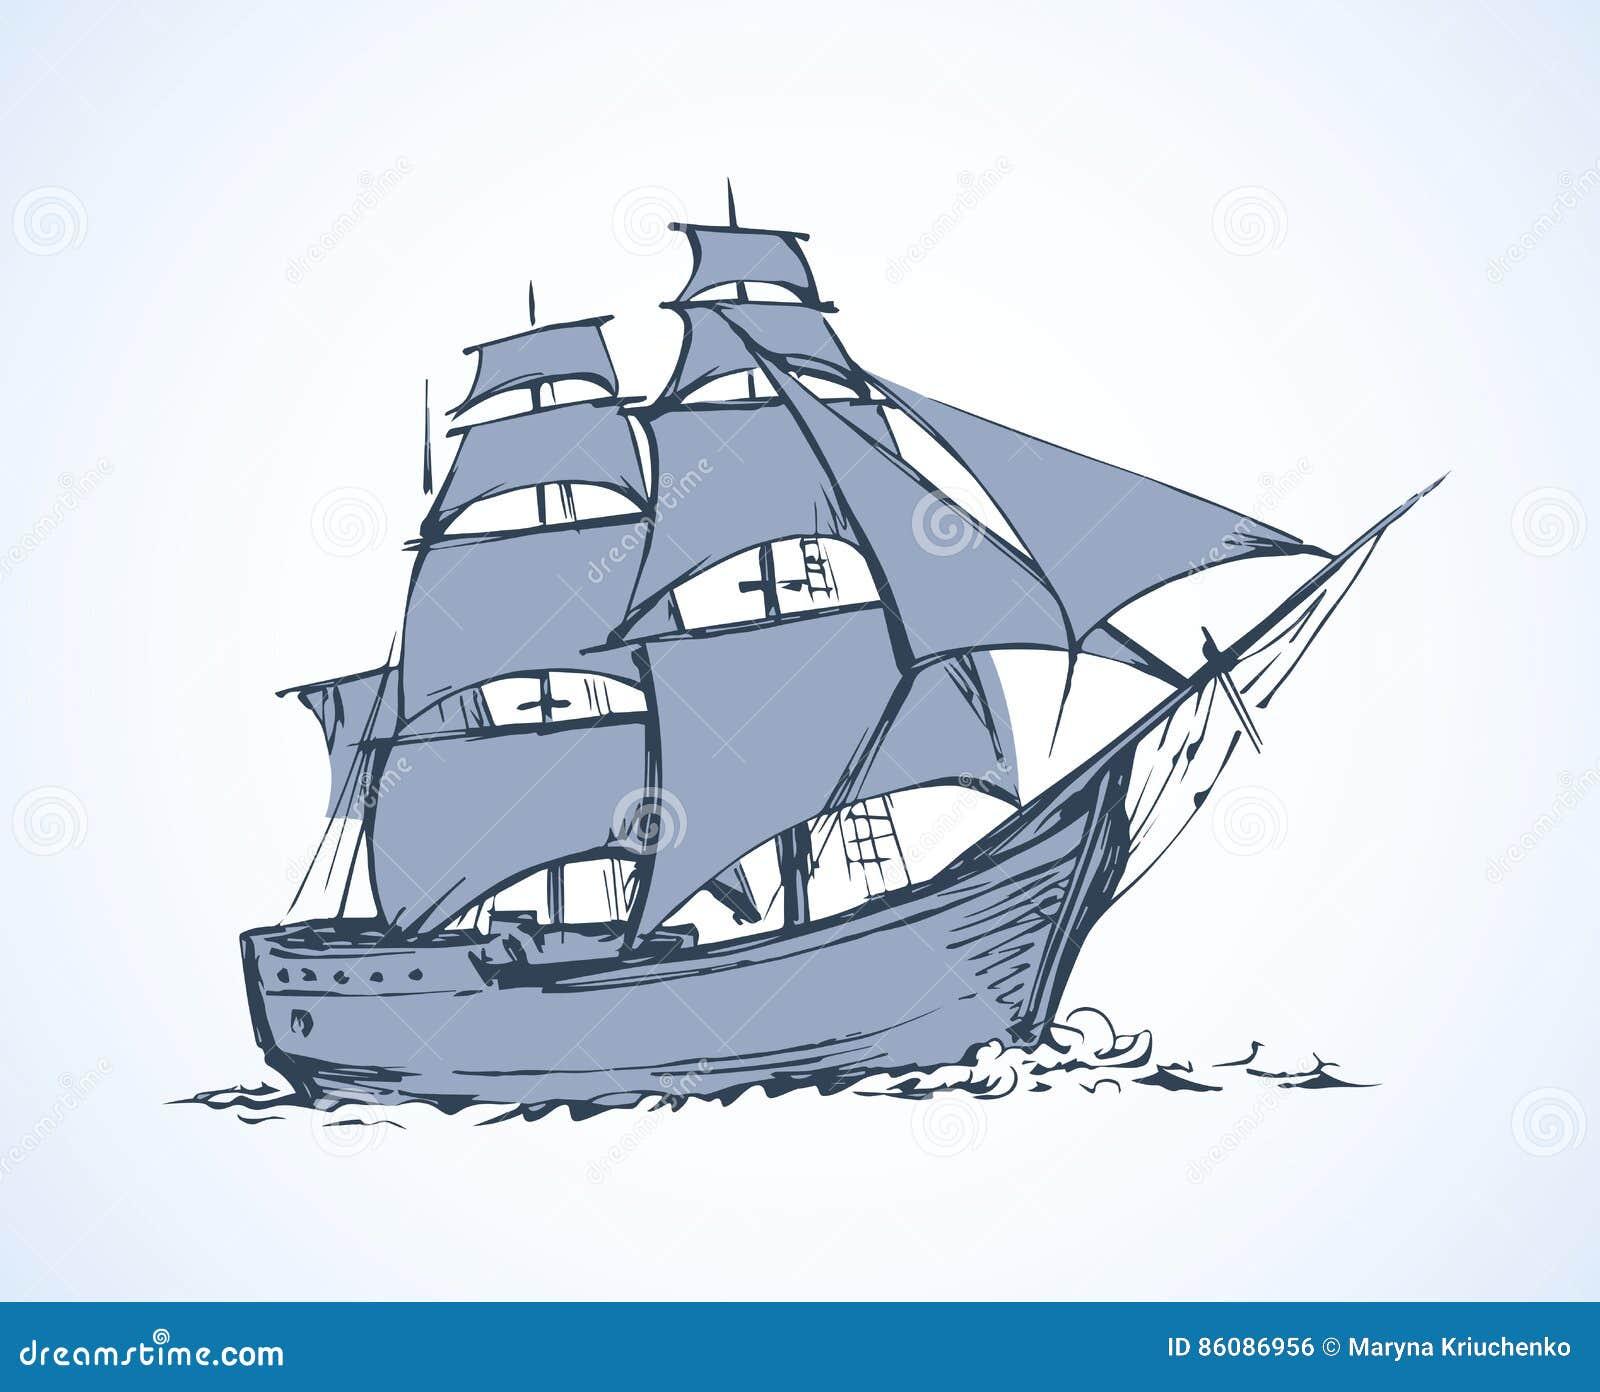 Sailing Vessel Vector Drawing